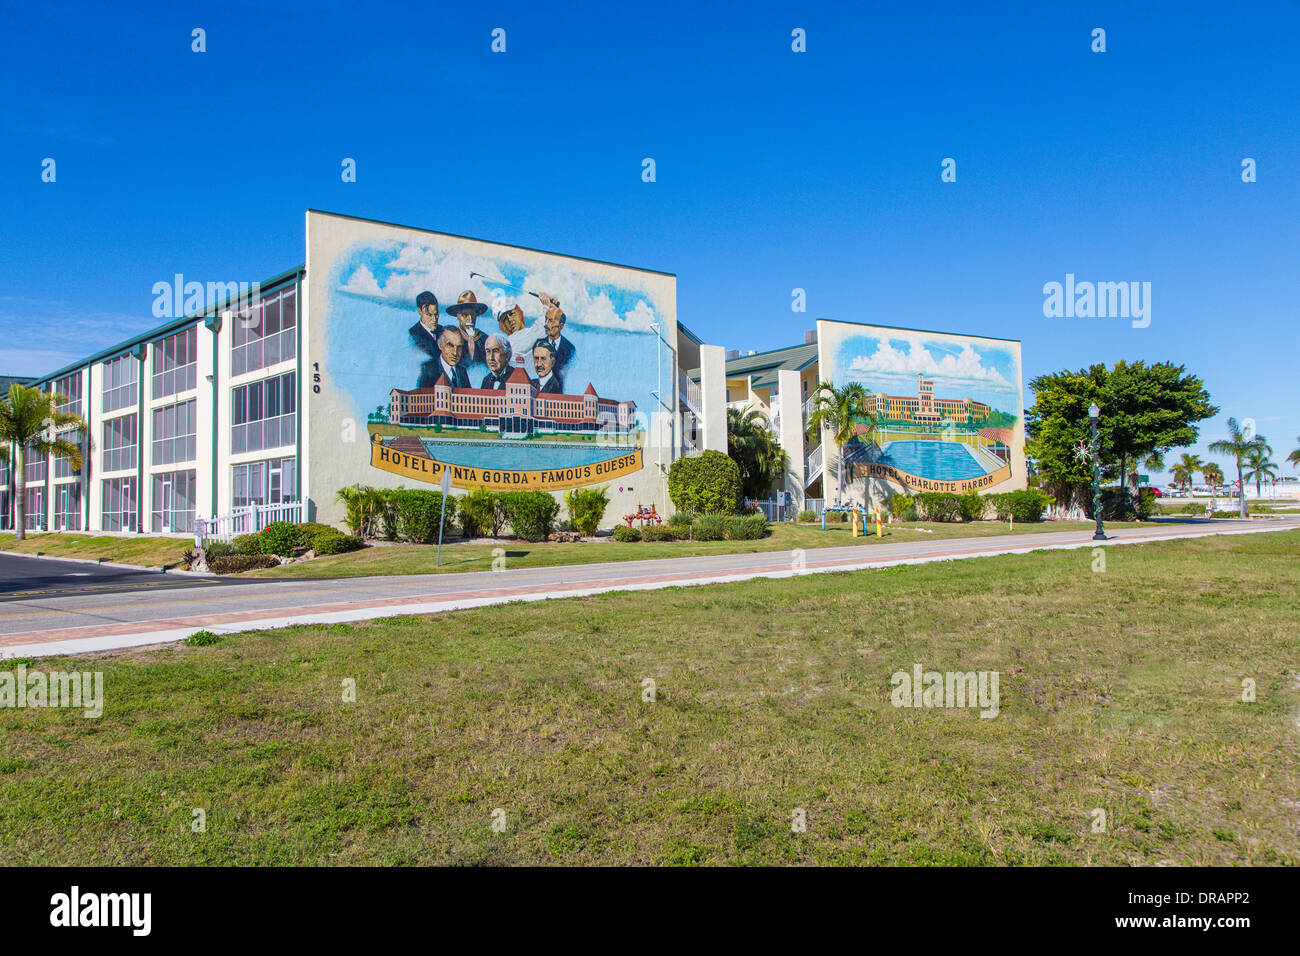 Murals painted on outdoor walls of buildings in Punta Gorda Florida - Stock Image